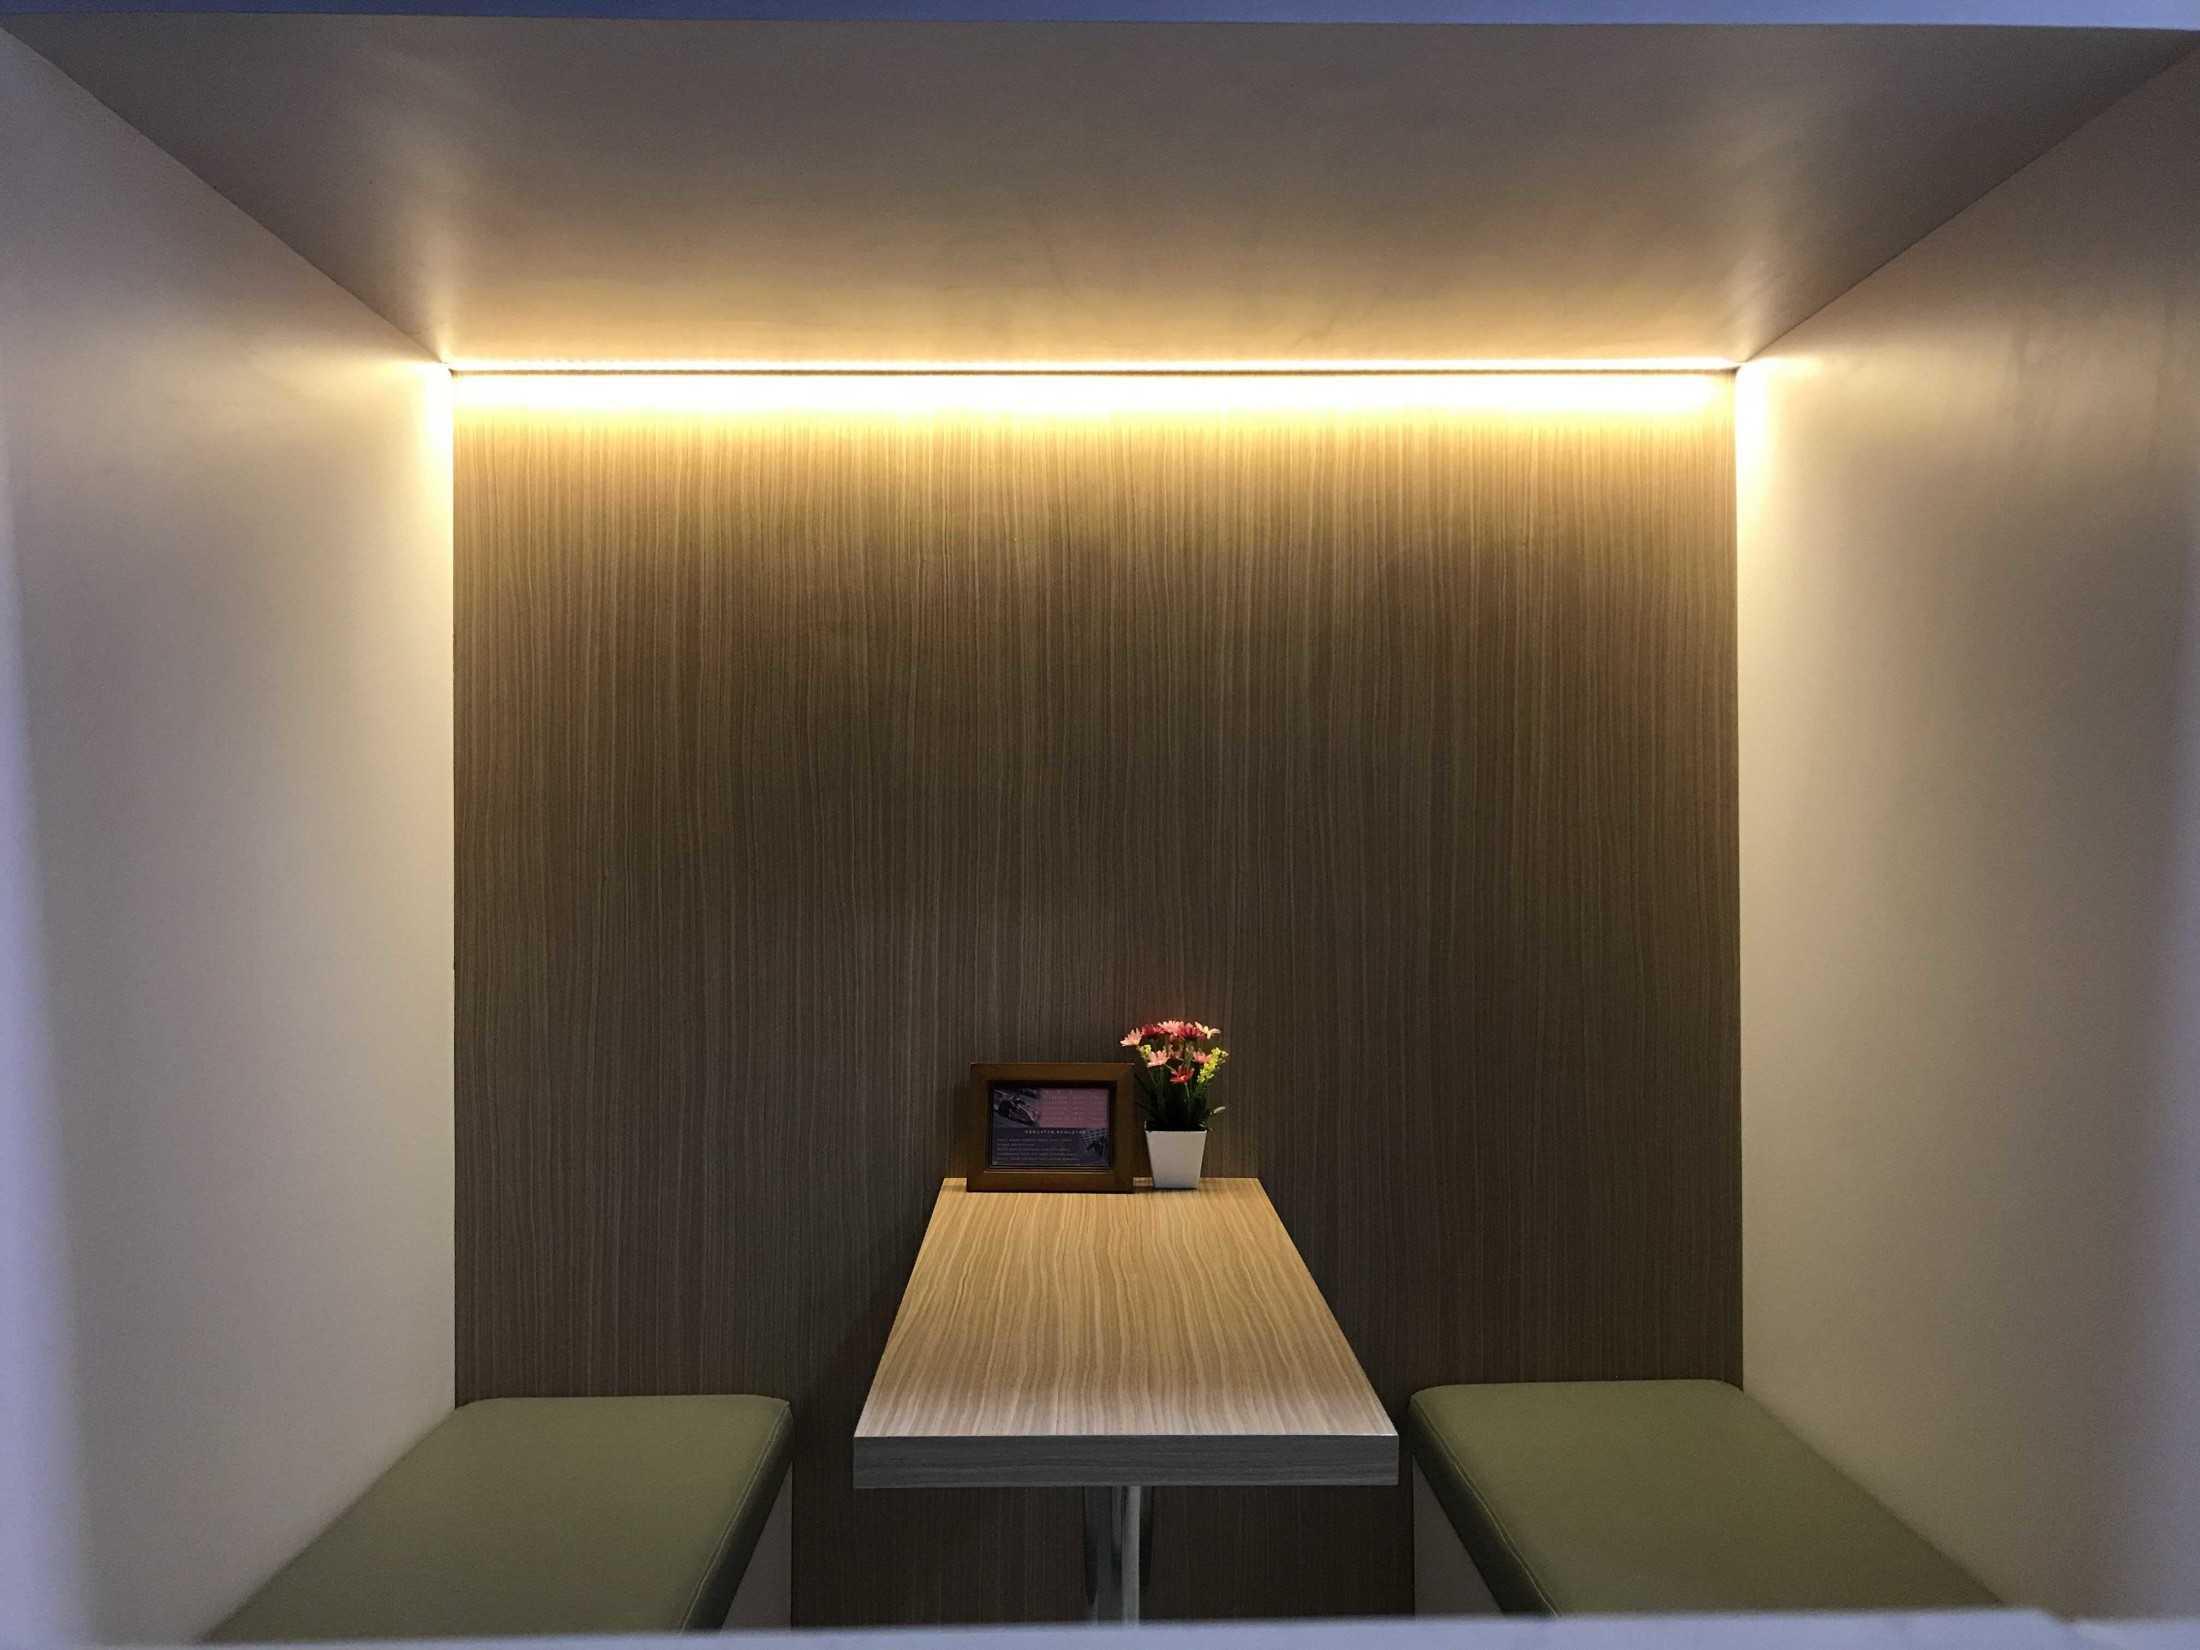 Ada Design Studio Office Plus Jl. Tj. Duren Timur 2 No.40-75, Rt.12/rw.1, Tj. Duren Sel., Grogol Petamburan, Kota Jakarta Barat, Daerah Khusus Ibukota Jakarta 11470, Indonesia Jl. Tj. Duren Timur 2 No.40-75, Rt.12/rw.1, Tj. Duren Sel., Grogol Petamburan, Kota Jakarta Barat, Daerah Khusus Ibukota Jakarta 11470, Indonesia Ada-Home-Office-Plus  68992